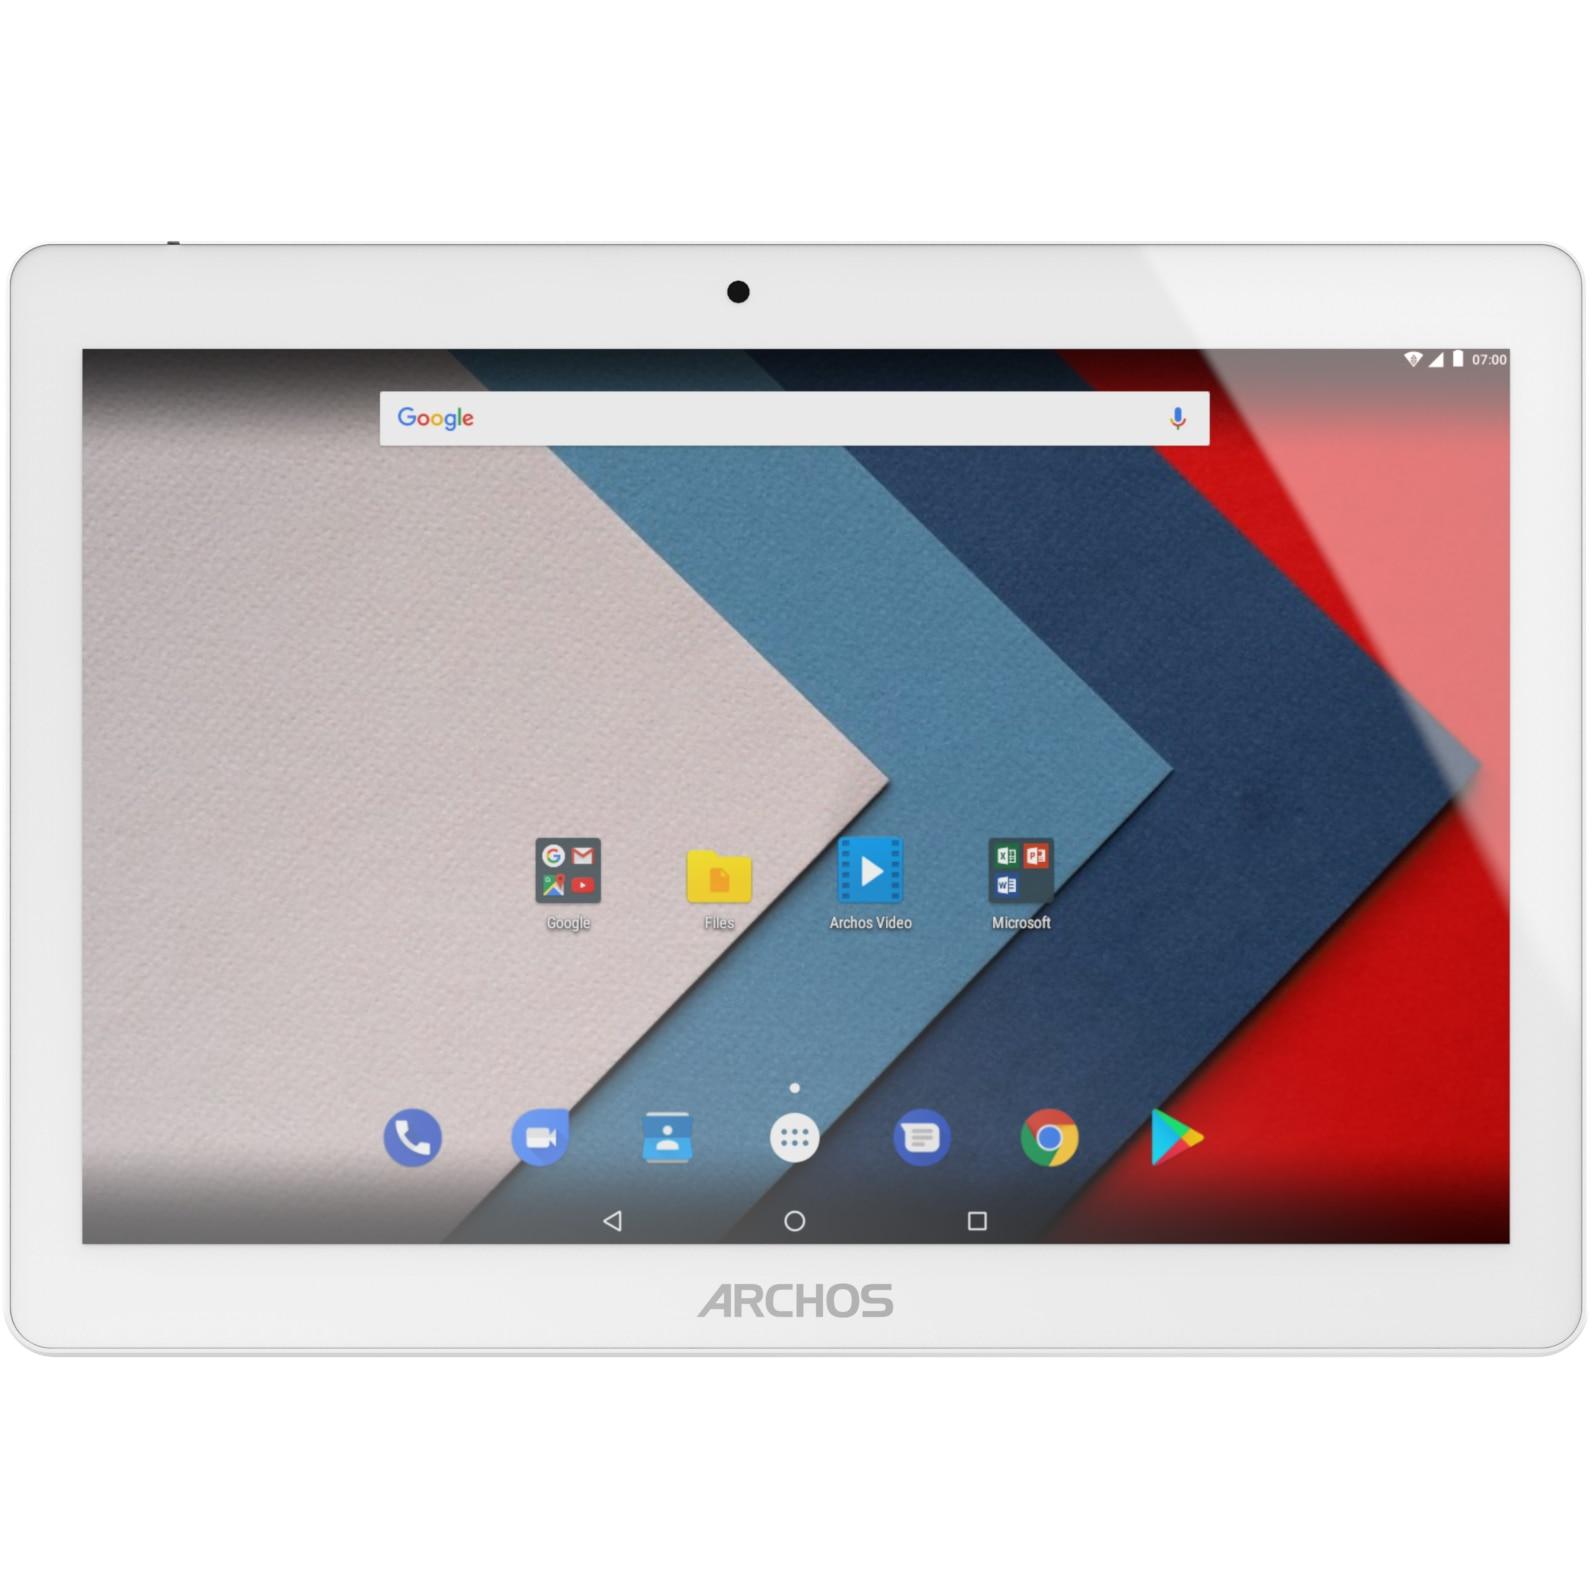 "Fotografie Tableta Archos Oxygen 101, Quad-Core 1.3GHz, 10.1"", 2GB RAM, 64GB, 4G, Silver"